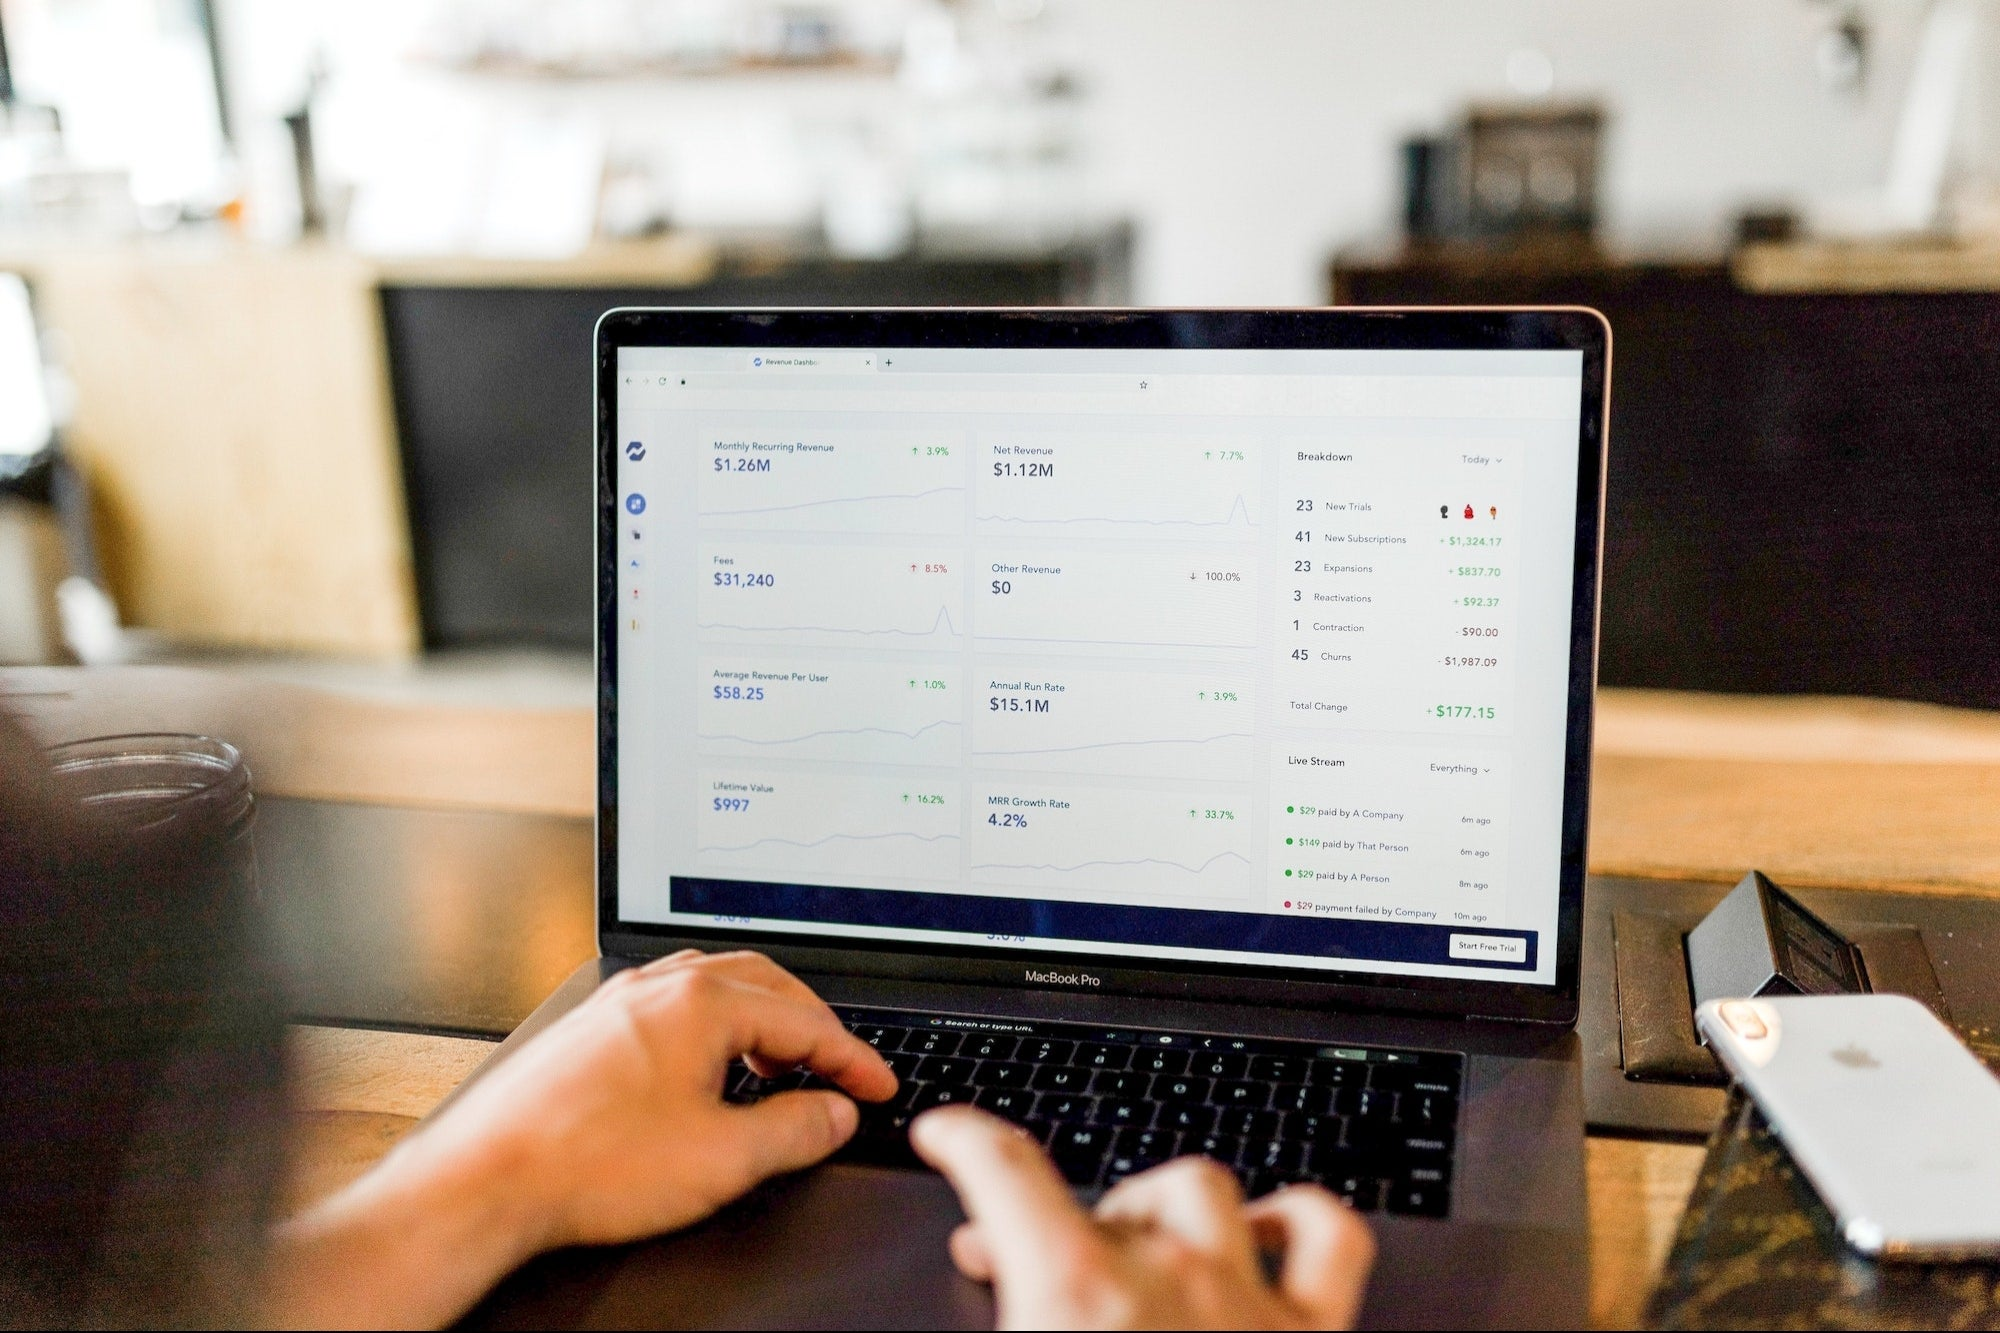 Start a Side Hustle by Selling on Amazon